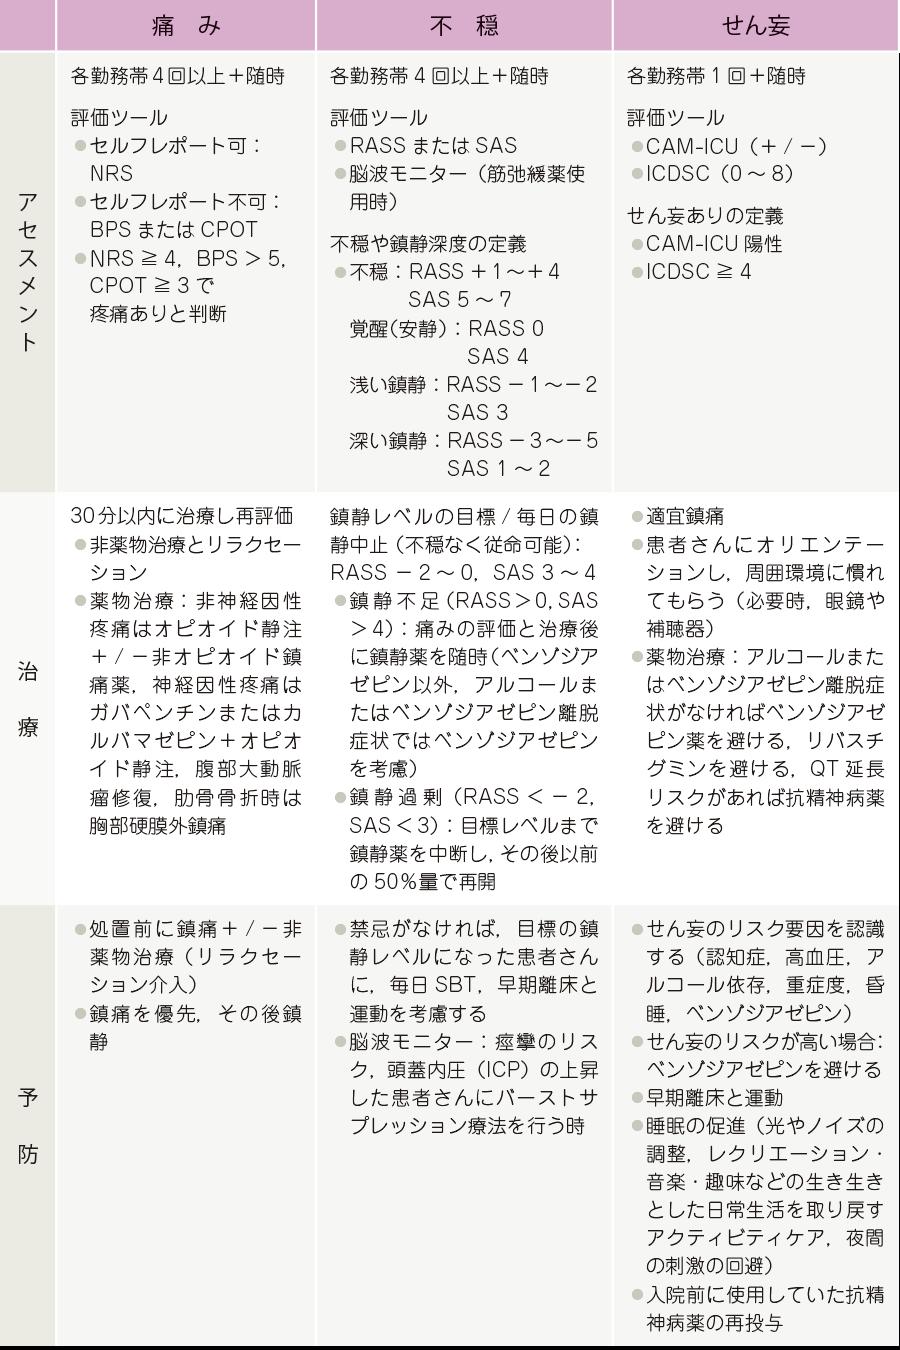 PAD ケアバンドル1)